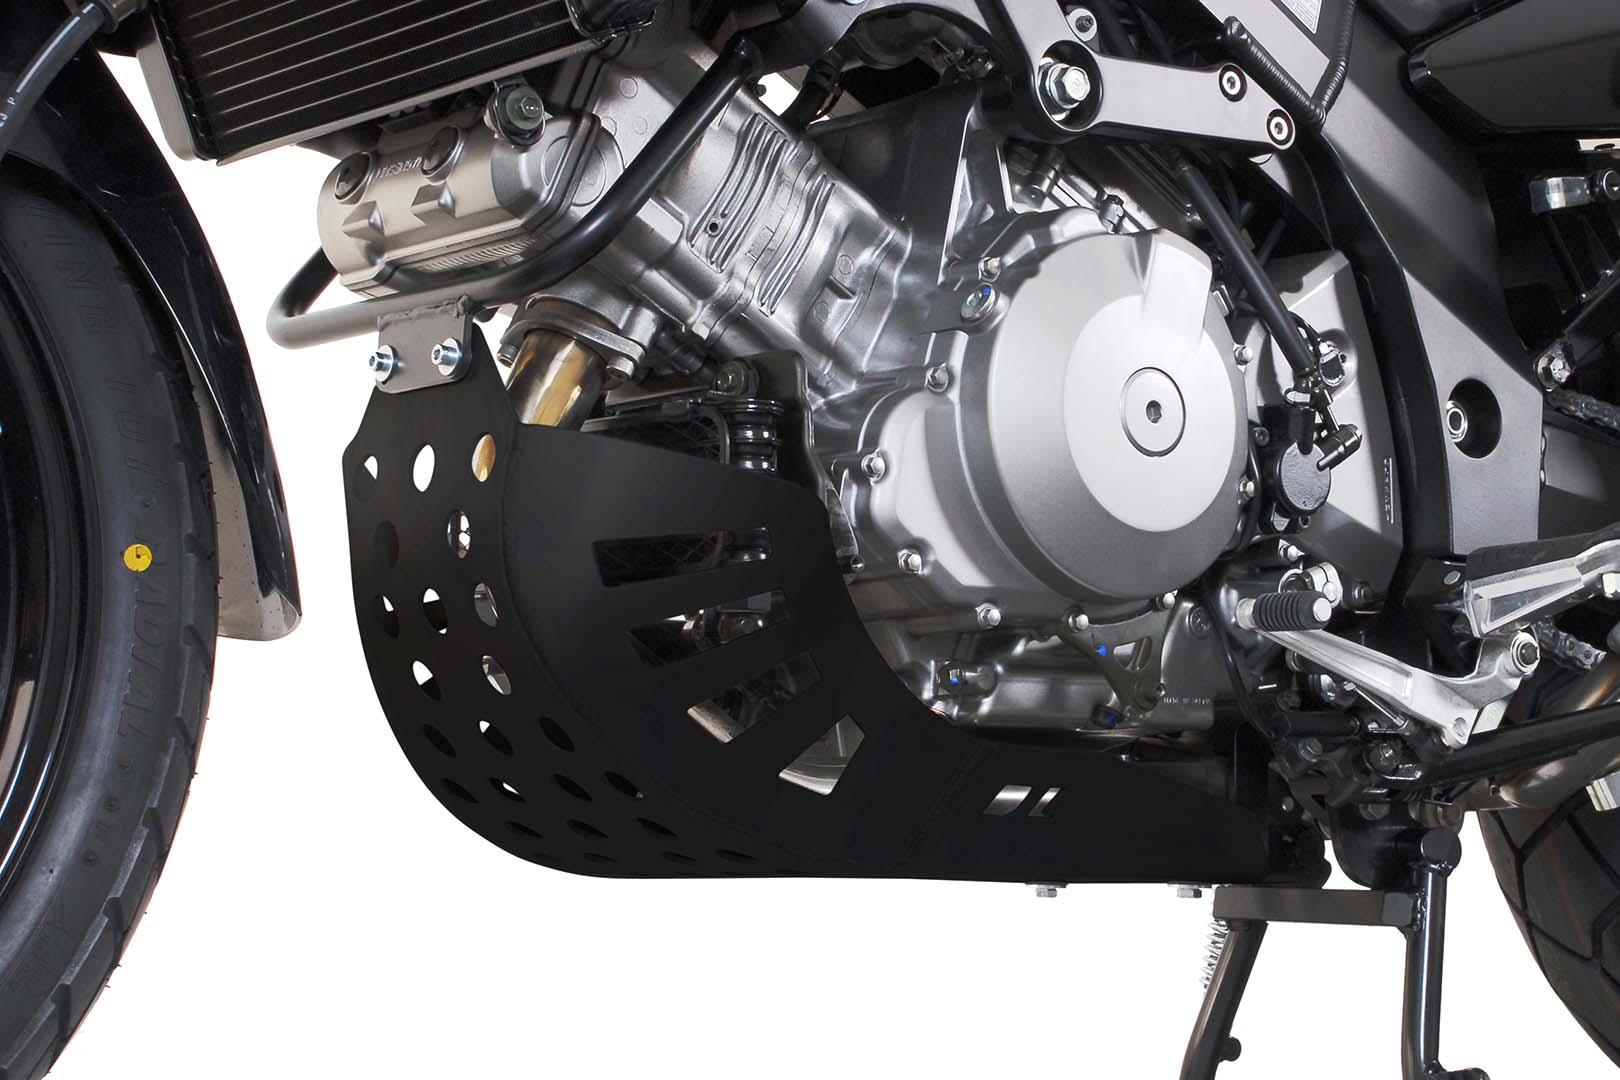 SW-Motech Pohjapanssari (moottorinsuojarautojen yht.) Suzuki DL1000 V-Strom must